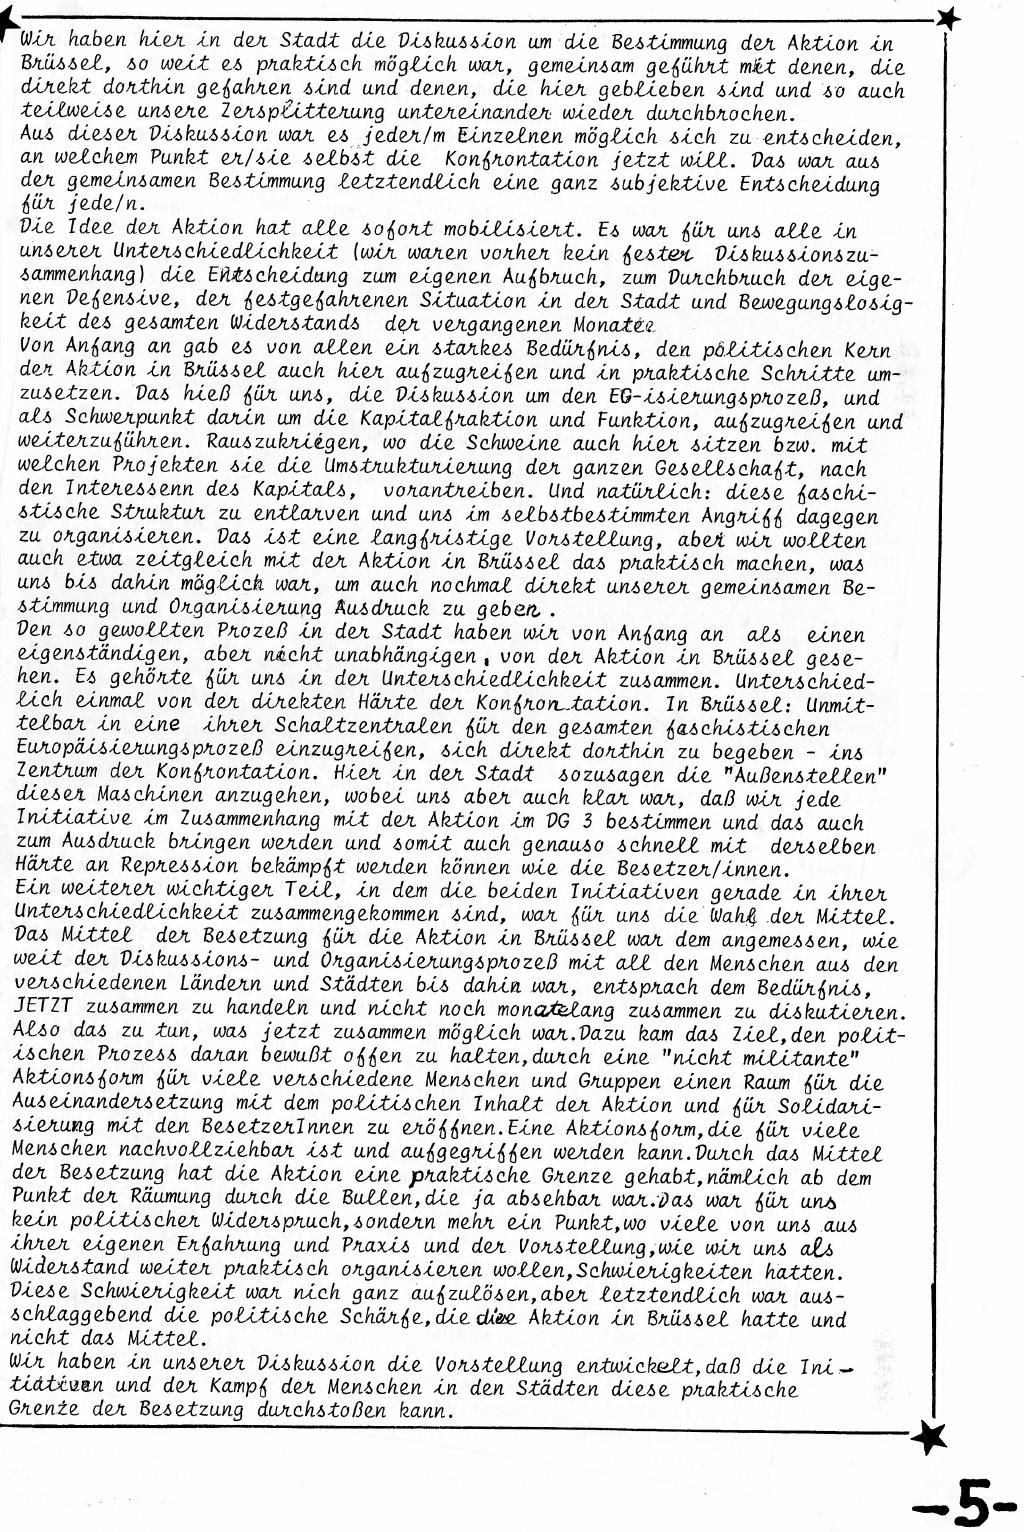 Belgien_Doku_Besetzung_EG_Kommission_1989_007